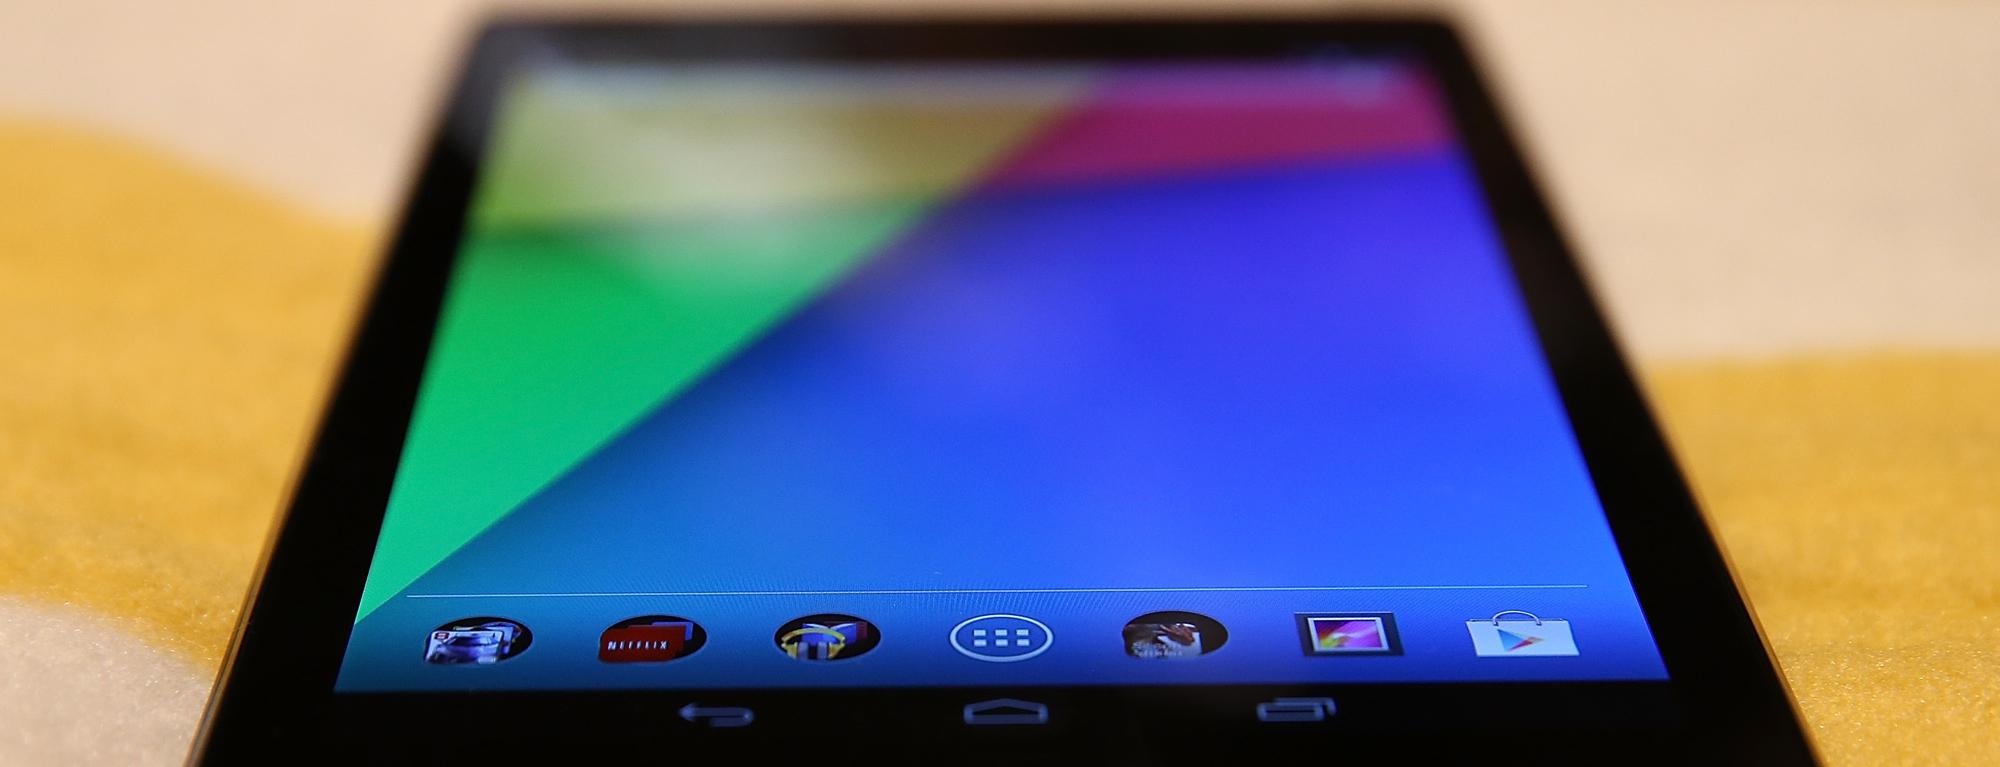 Tablets in 2013: Google, Apple, Samsung, Amazon, Microsoft